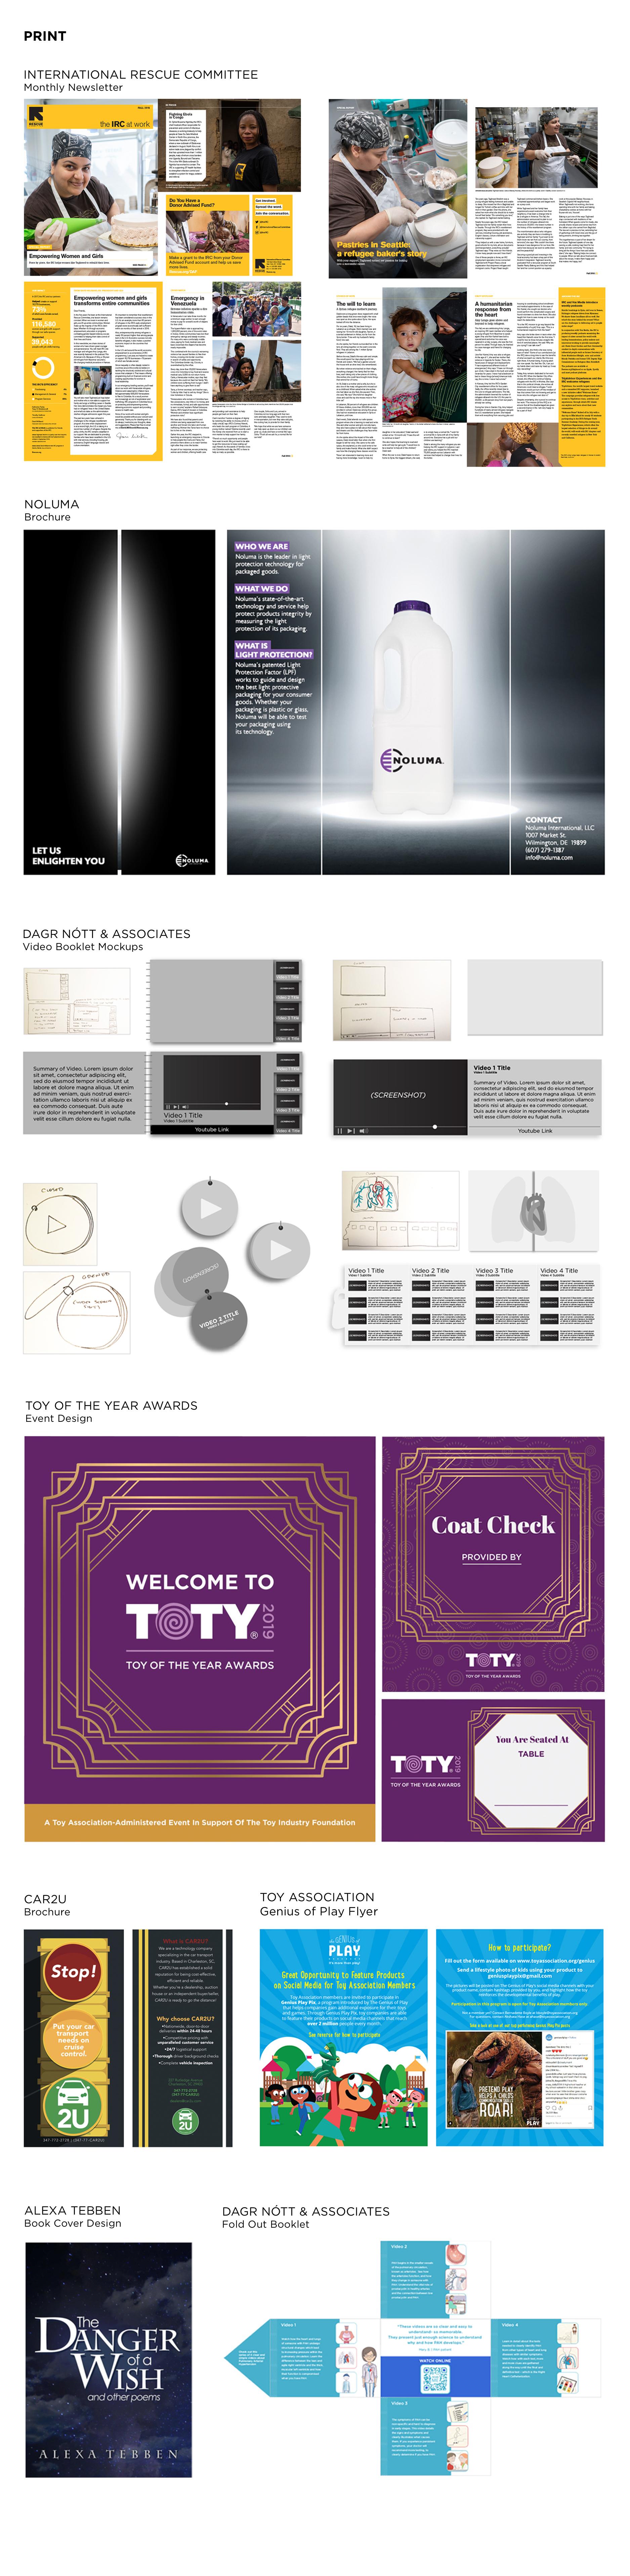 Print-PortfolioBoard-040319.jpg